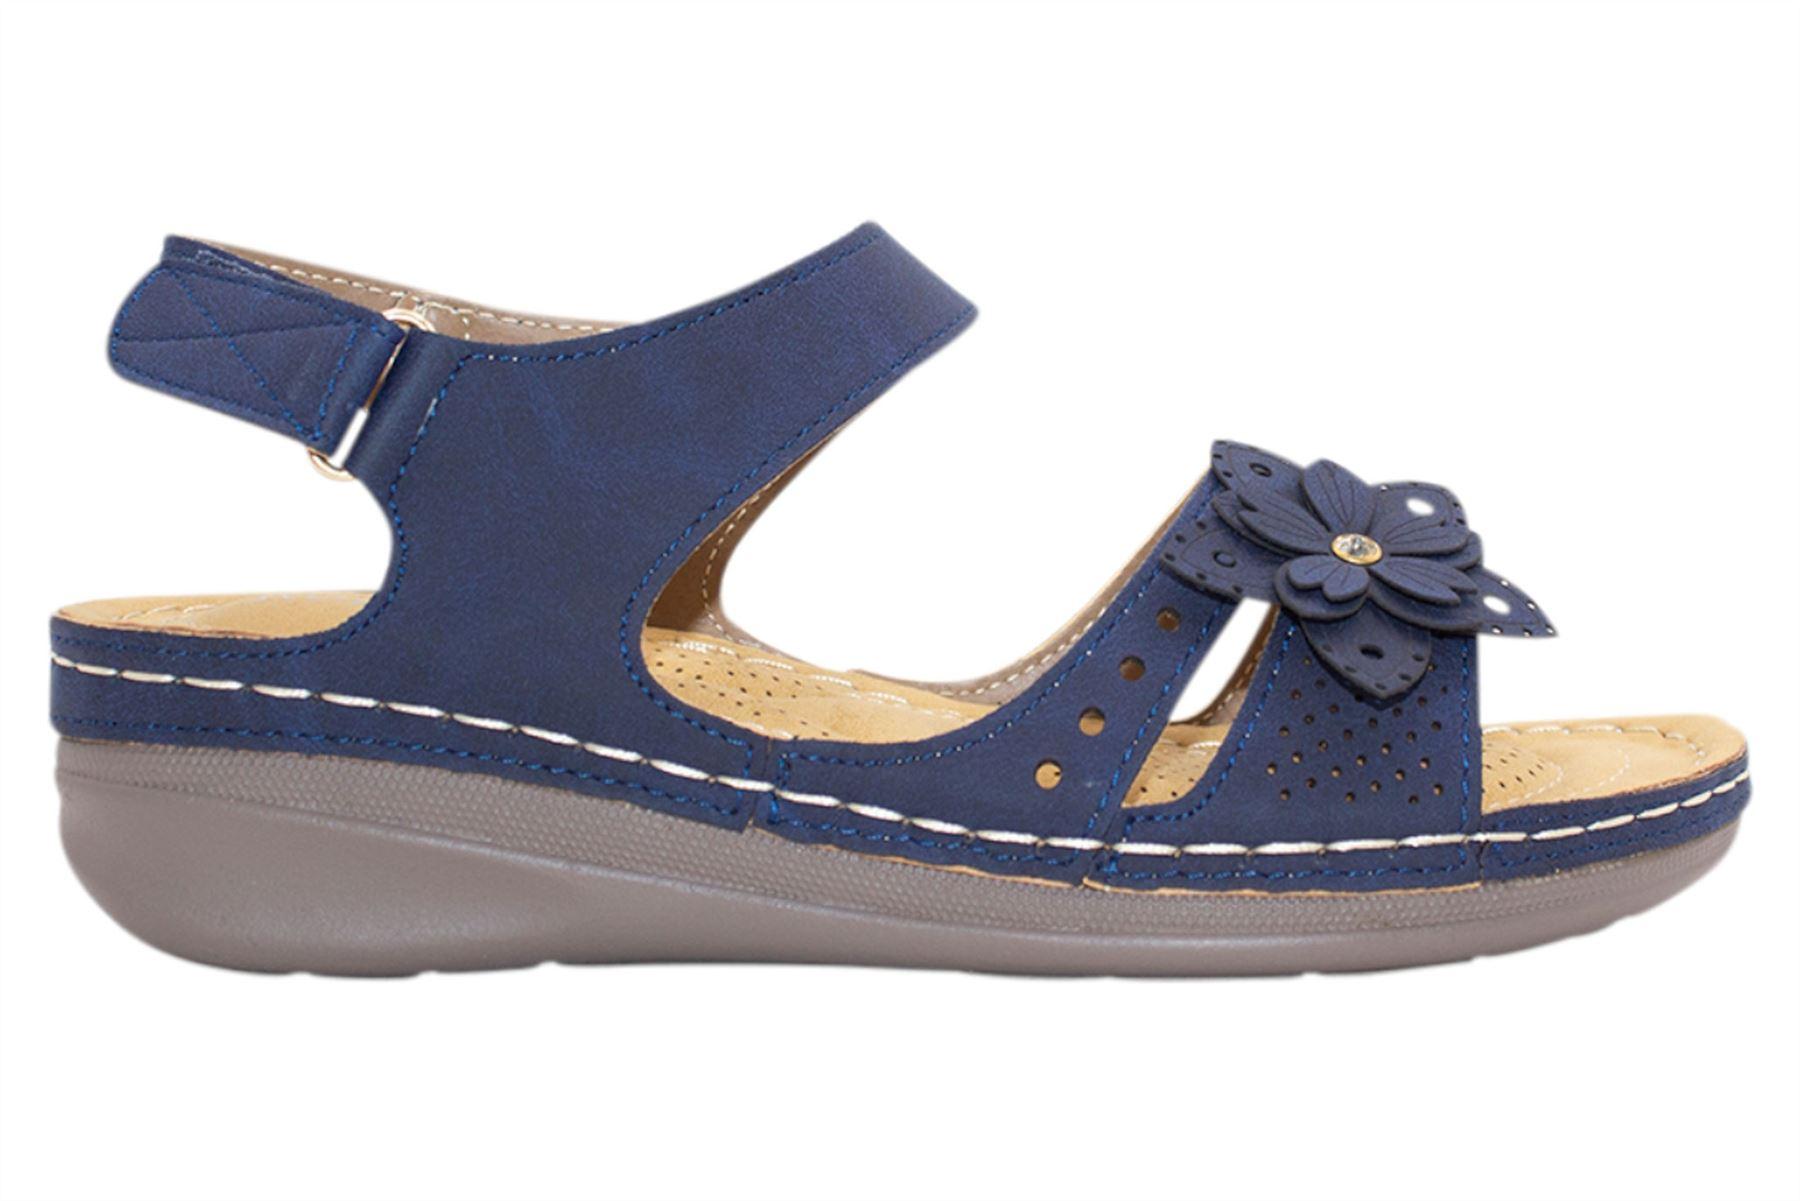 Ladies-Wedge-Heel-Sandal-Womens-Comfort-Cushion-Strapy-Summer-Shoes miniatura 32